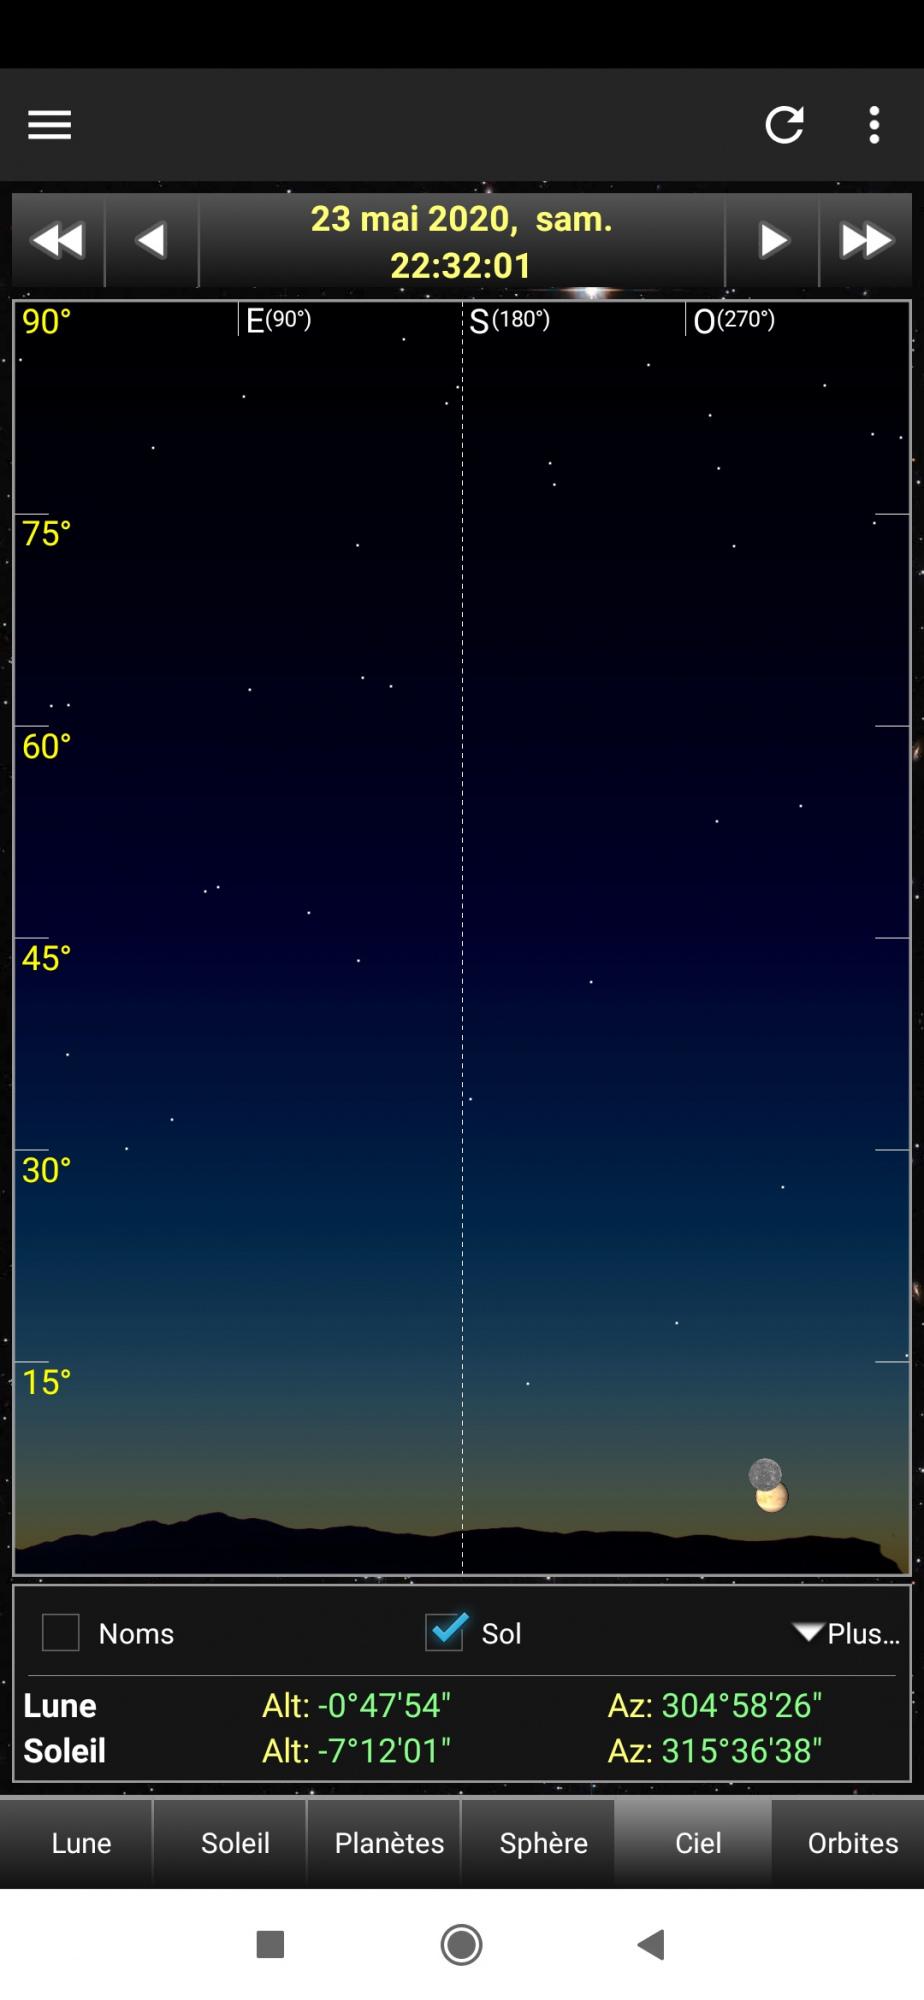 Screenshot_2020-05-23-22-32-57-180_com.dafftin.android.moon_phase.thumb.jpg.40f29d5bc991543cc11aad850cdc50a3.jpg